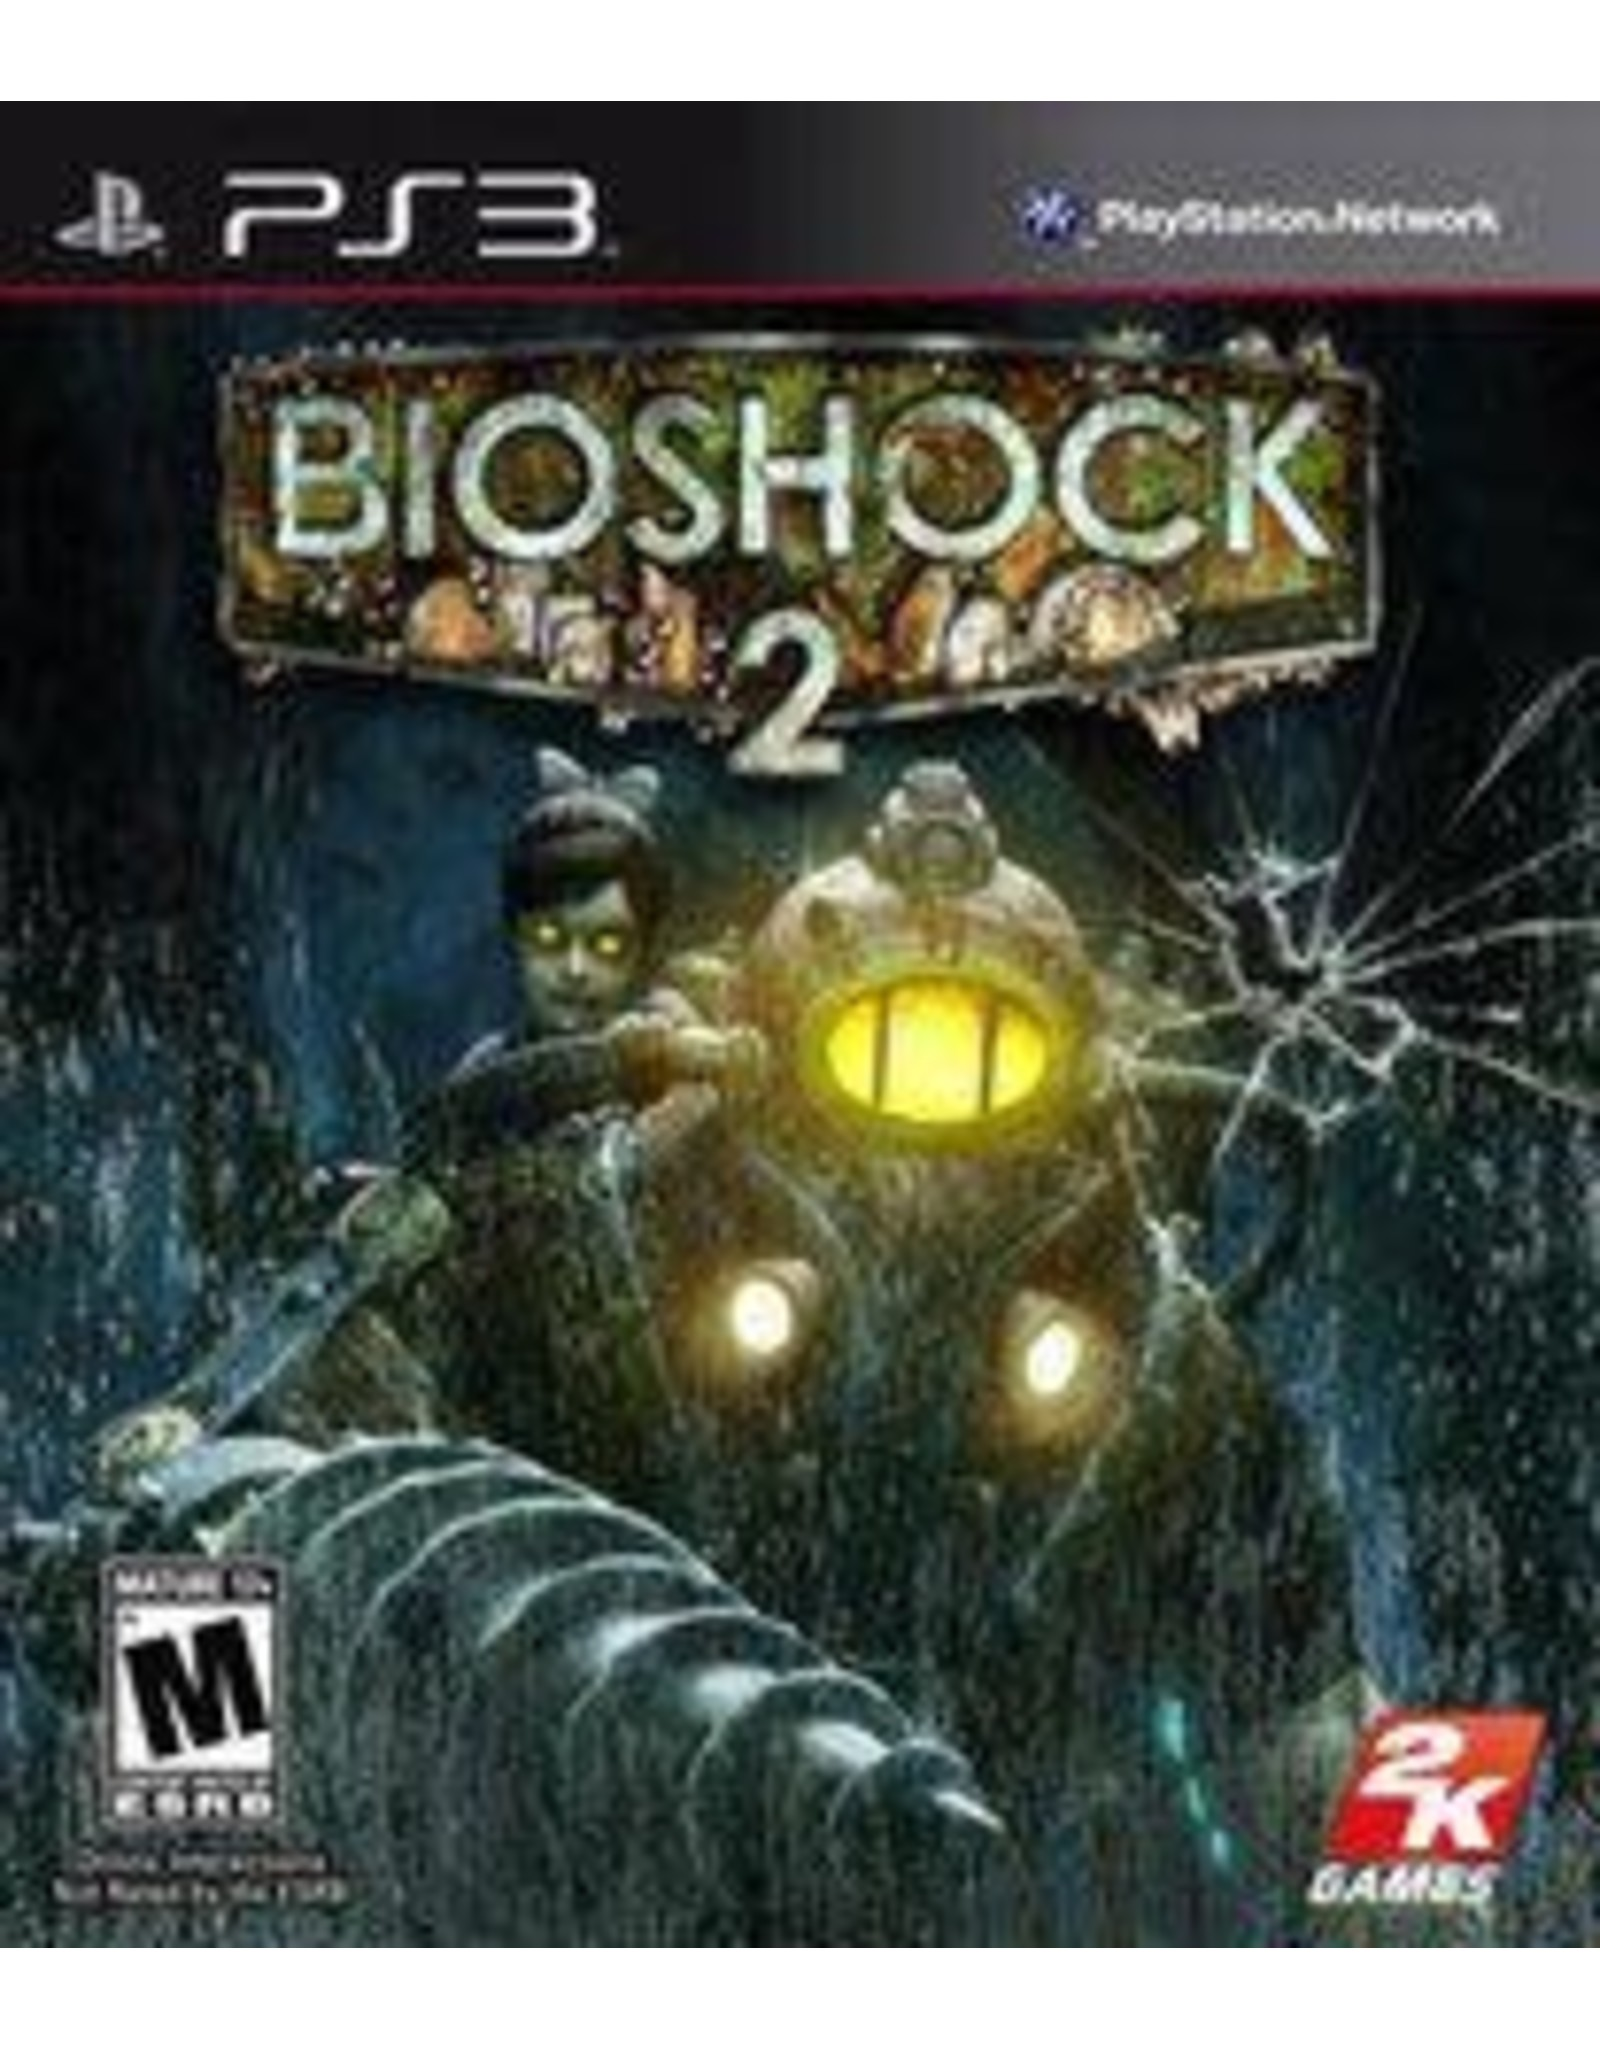 Playstation 3 BioShock 2 (CIB)